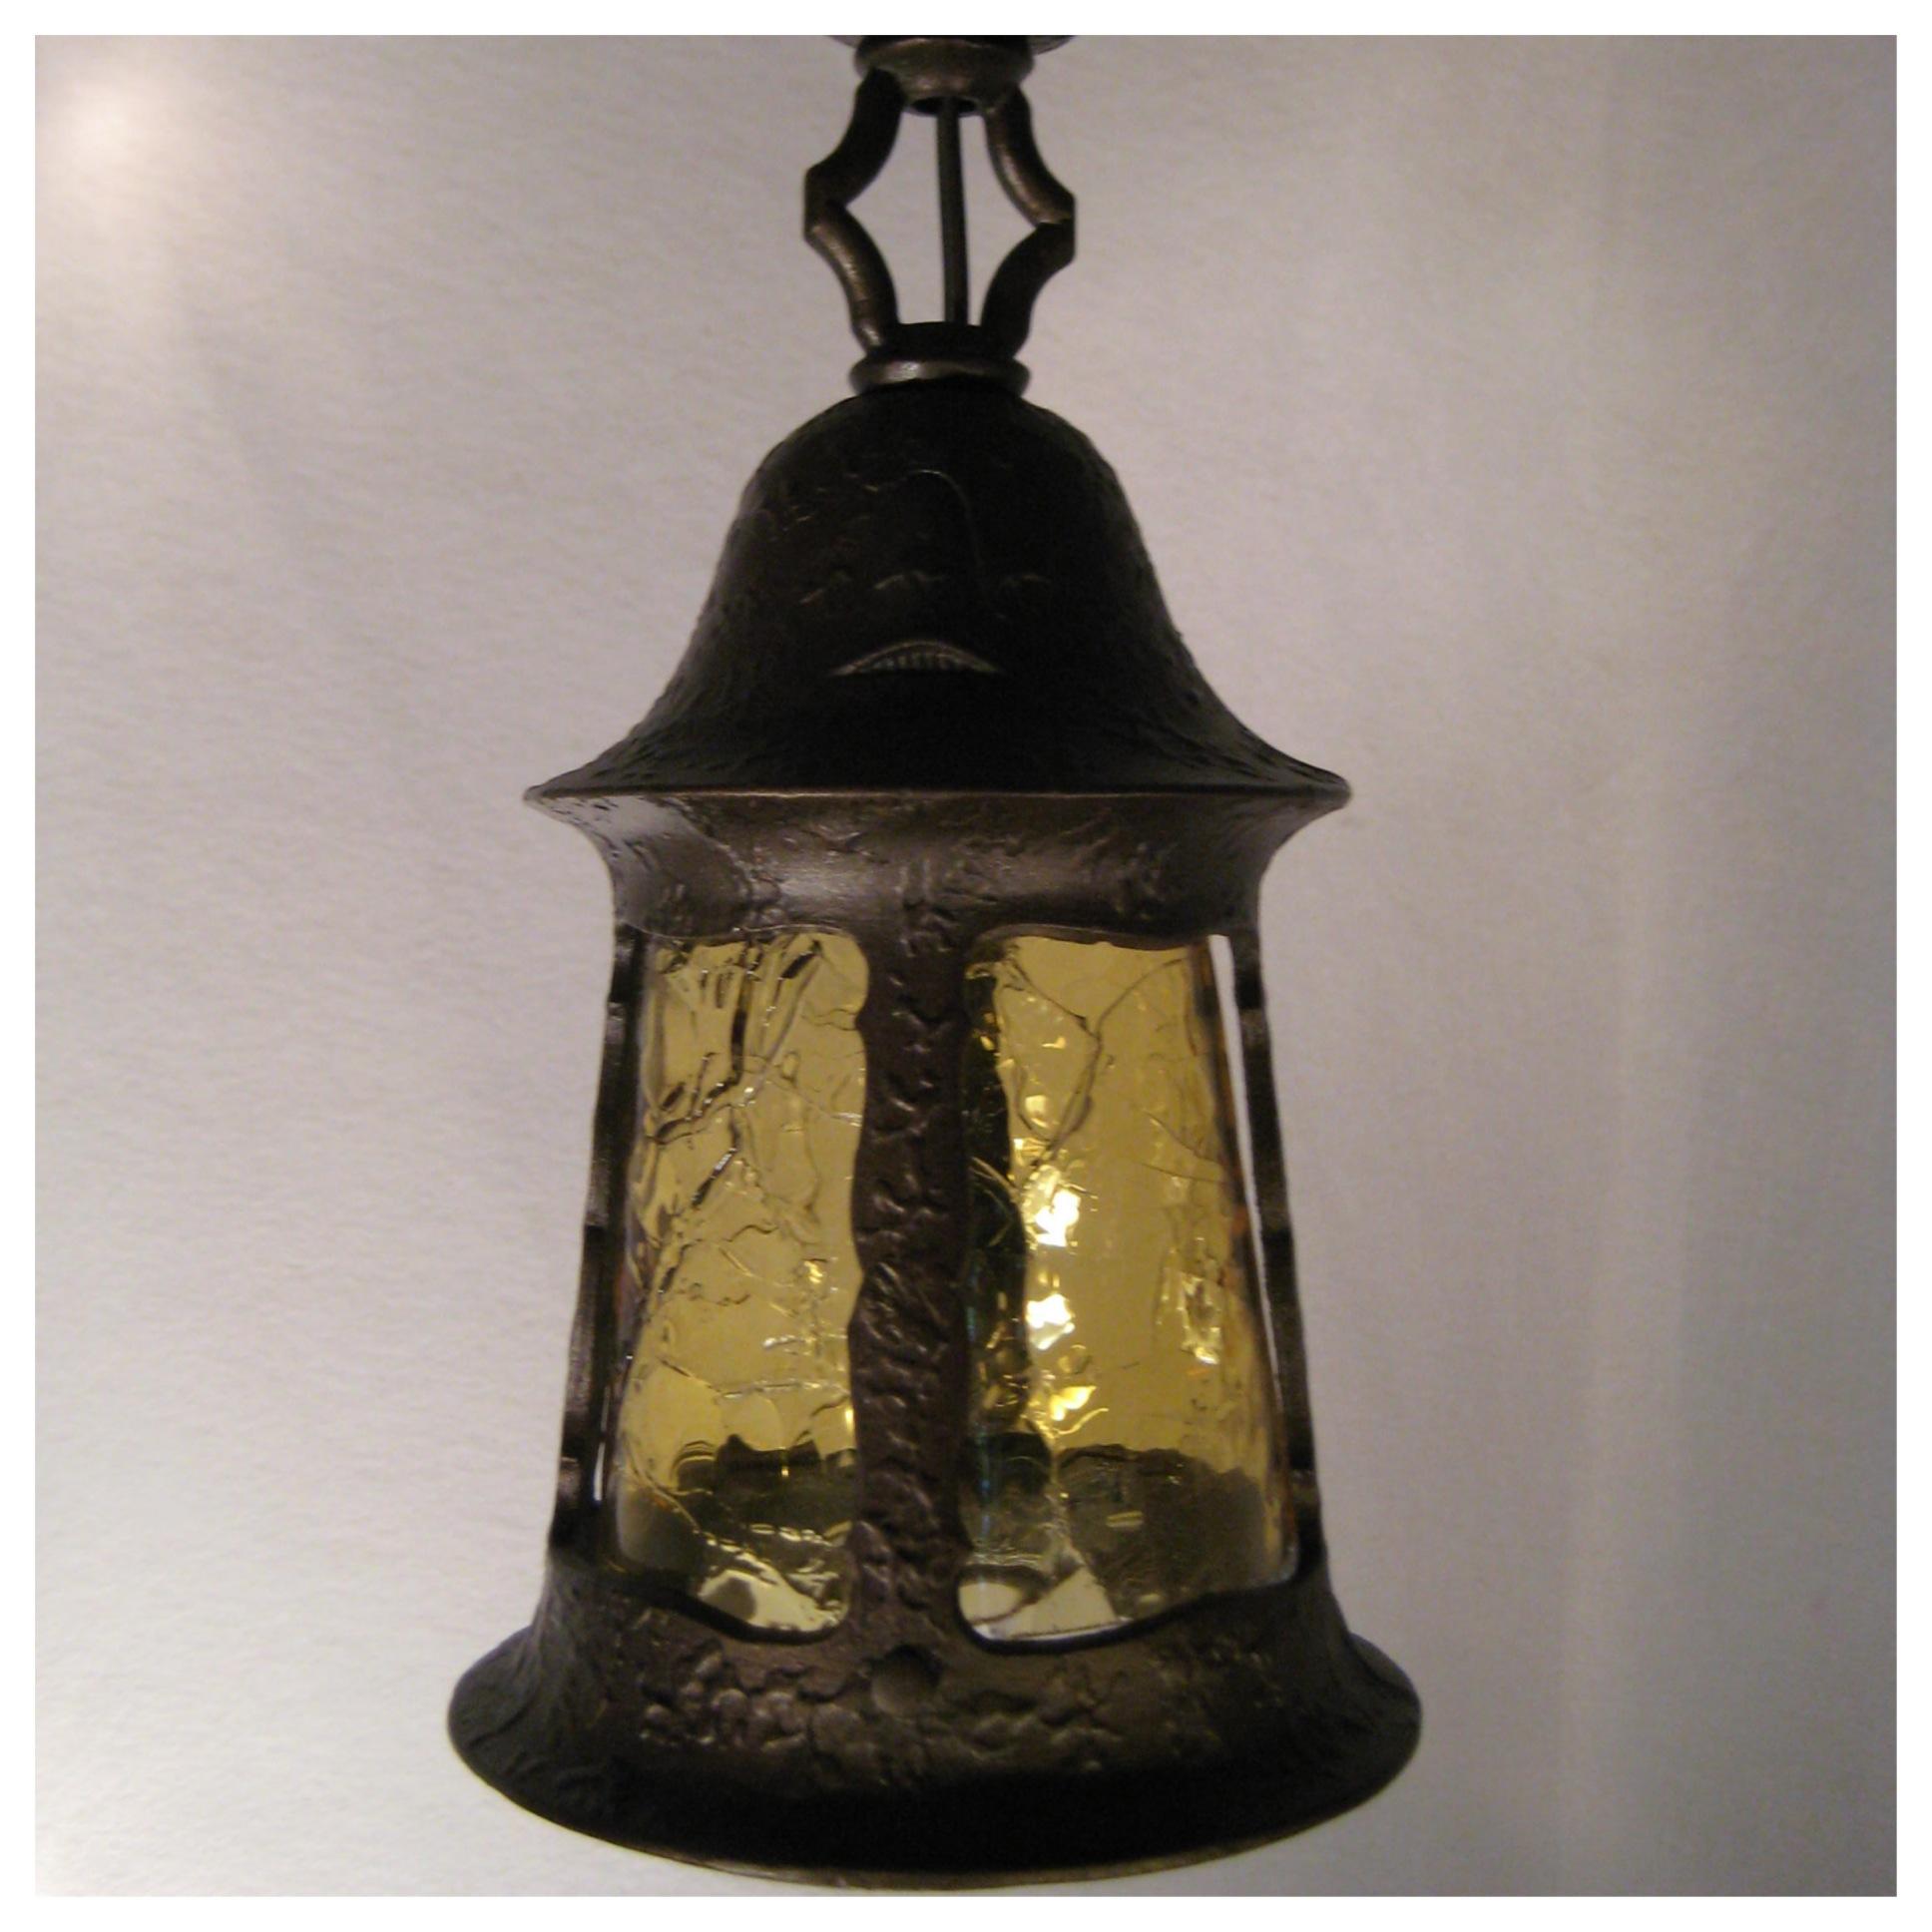 Outdoor Lighting Fixtures Arts And Crafts A8237 Pair Exterior Story Book Lights Bogart Bremmer Bradley Anti